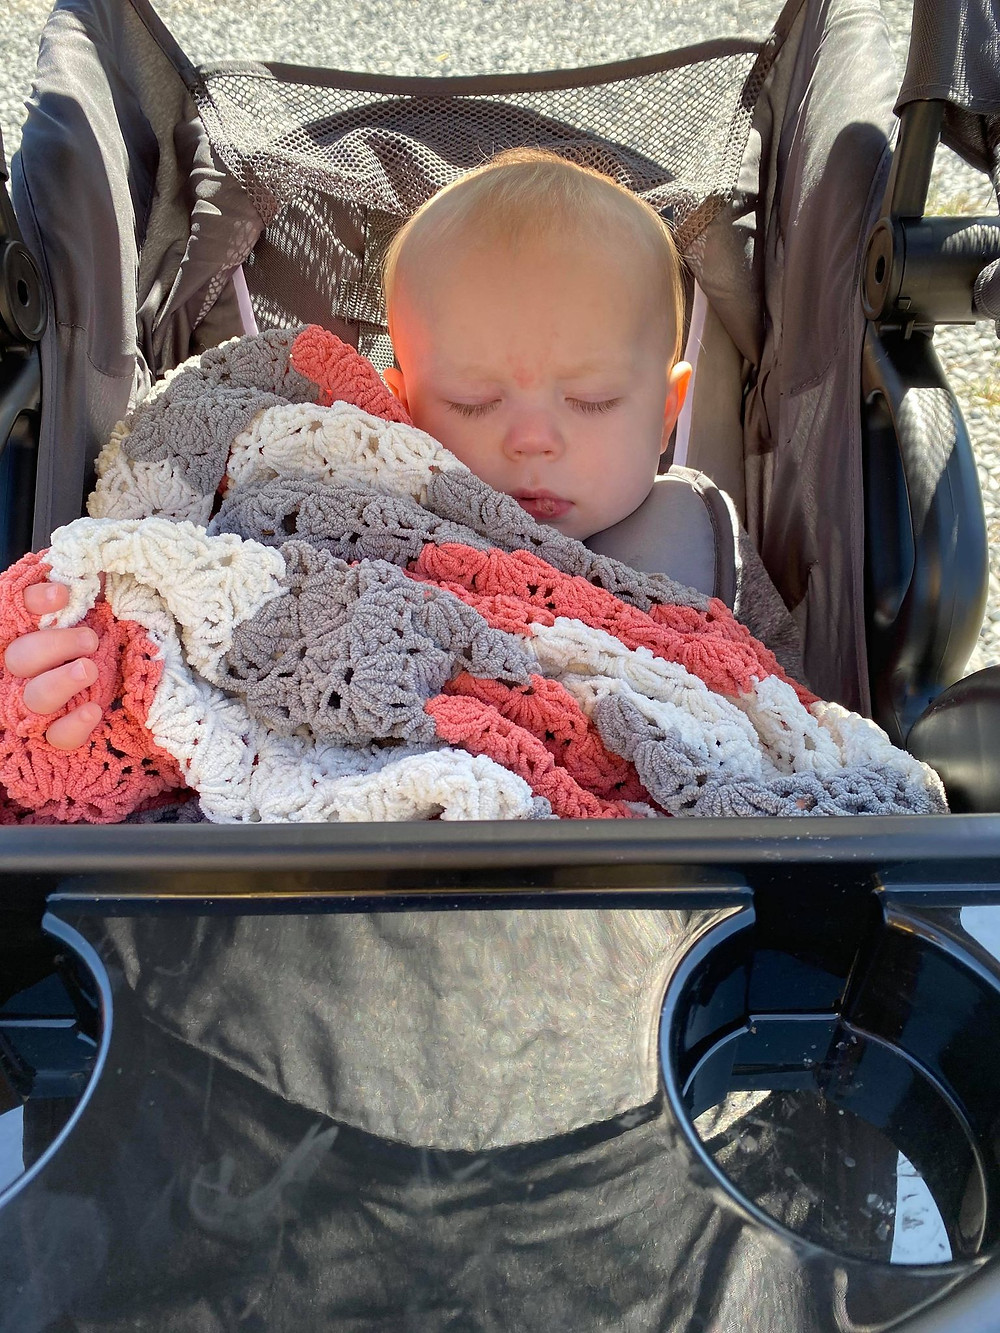 baby, toddler, infant, sleeping, camping